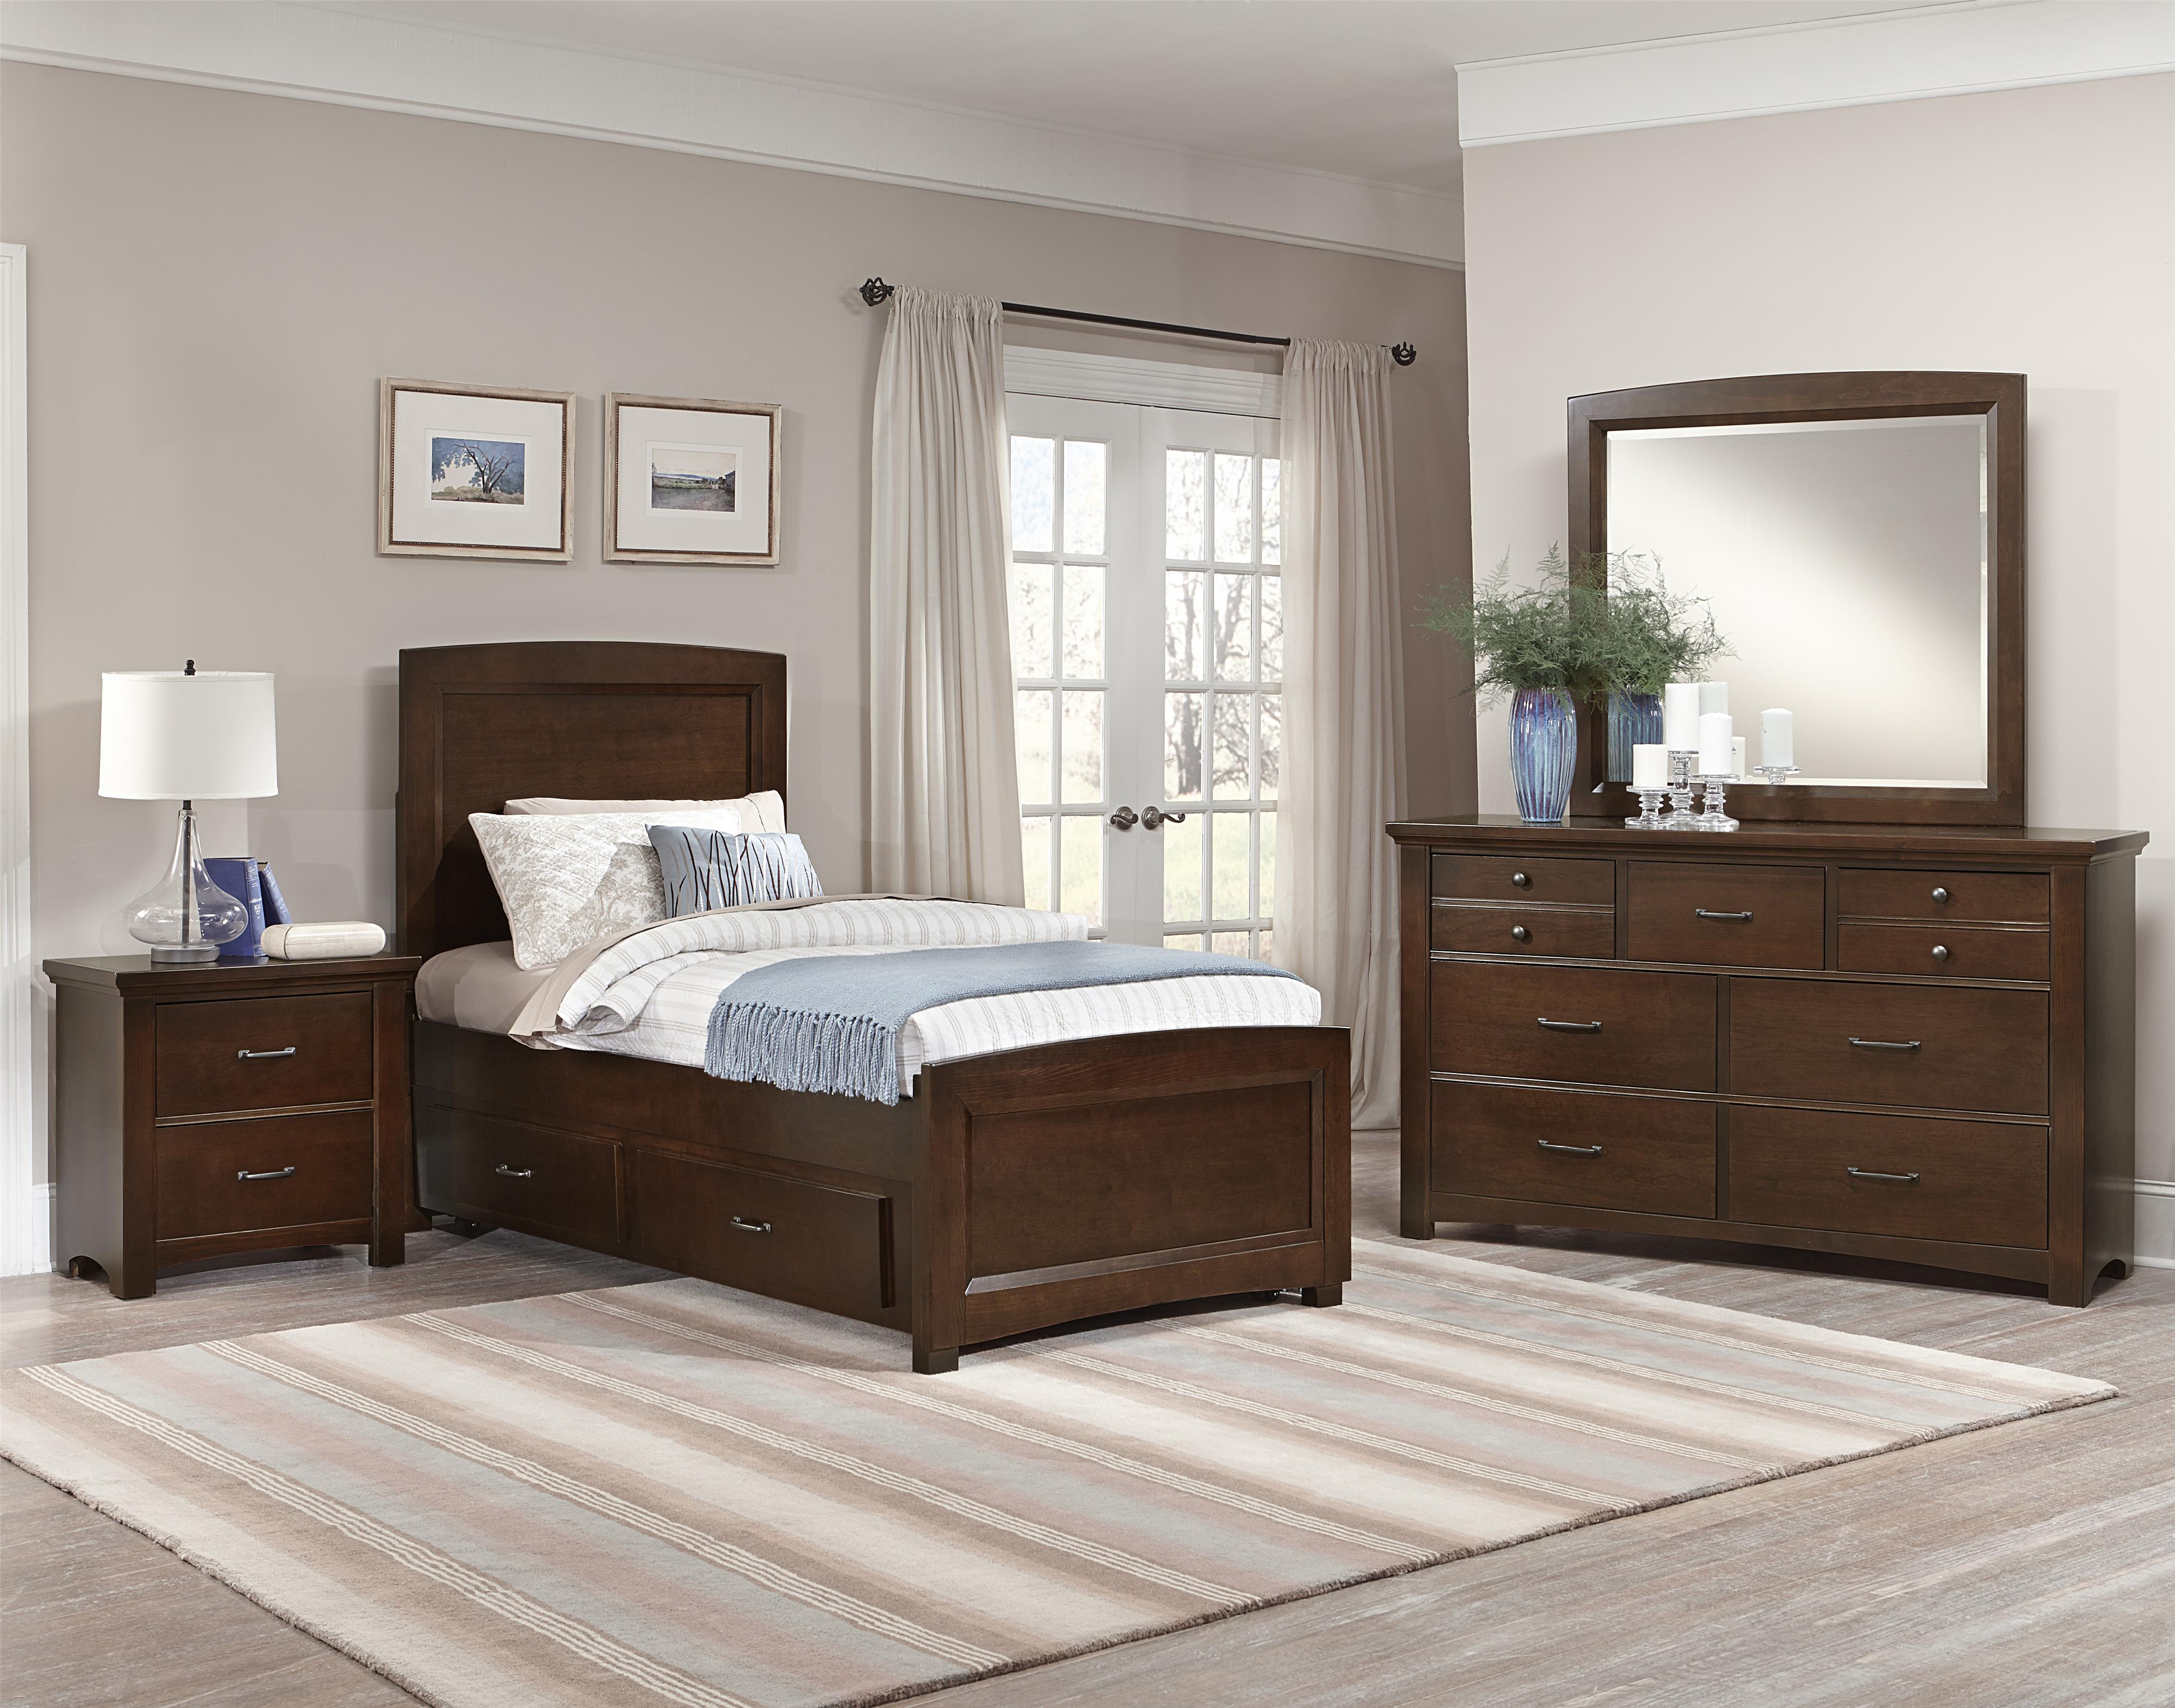 vaughan bassett transitions twin bedroom group h l stephens bedroom groups. Black Bedroom Furniture Sets. Home Design Ideas